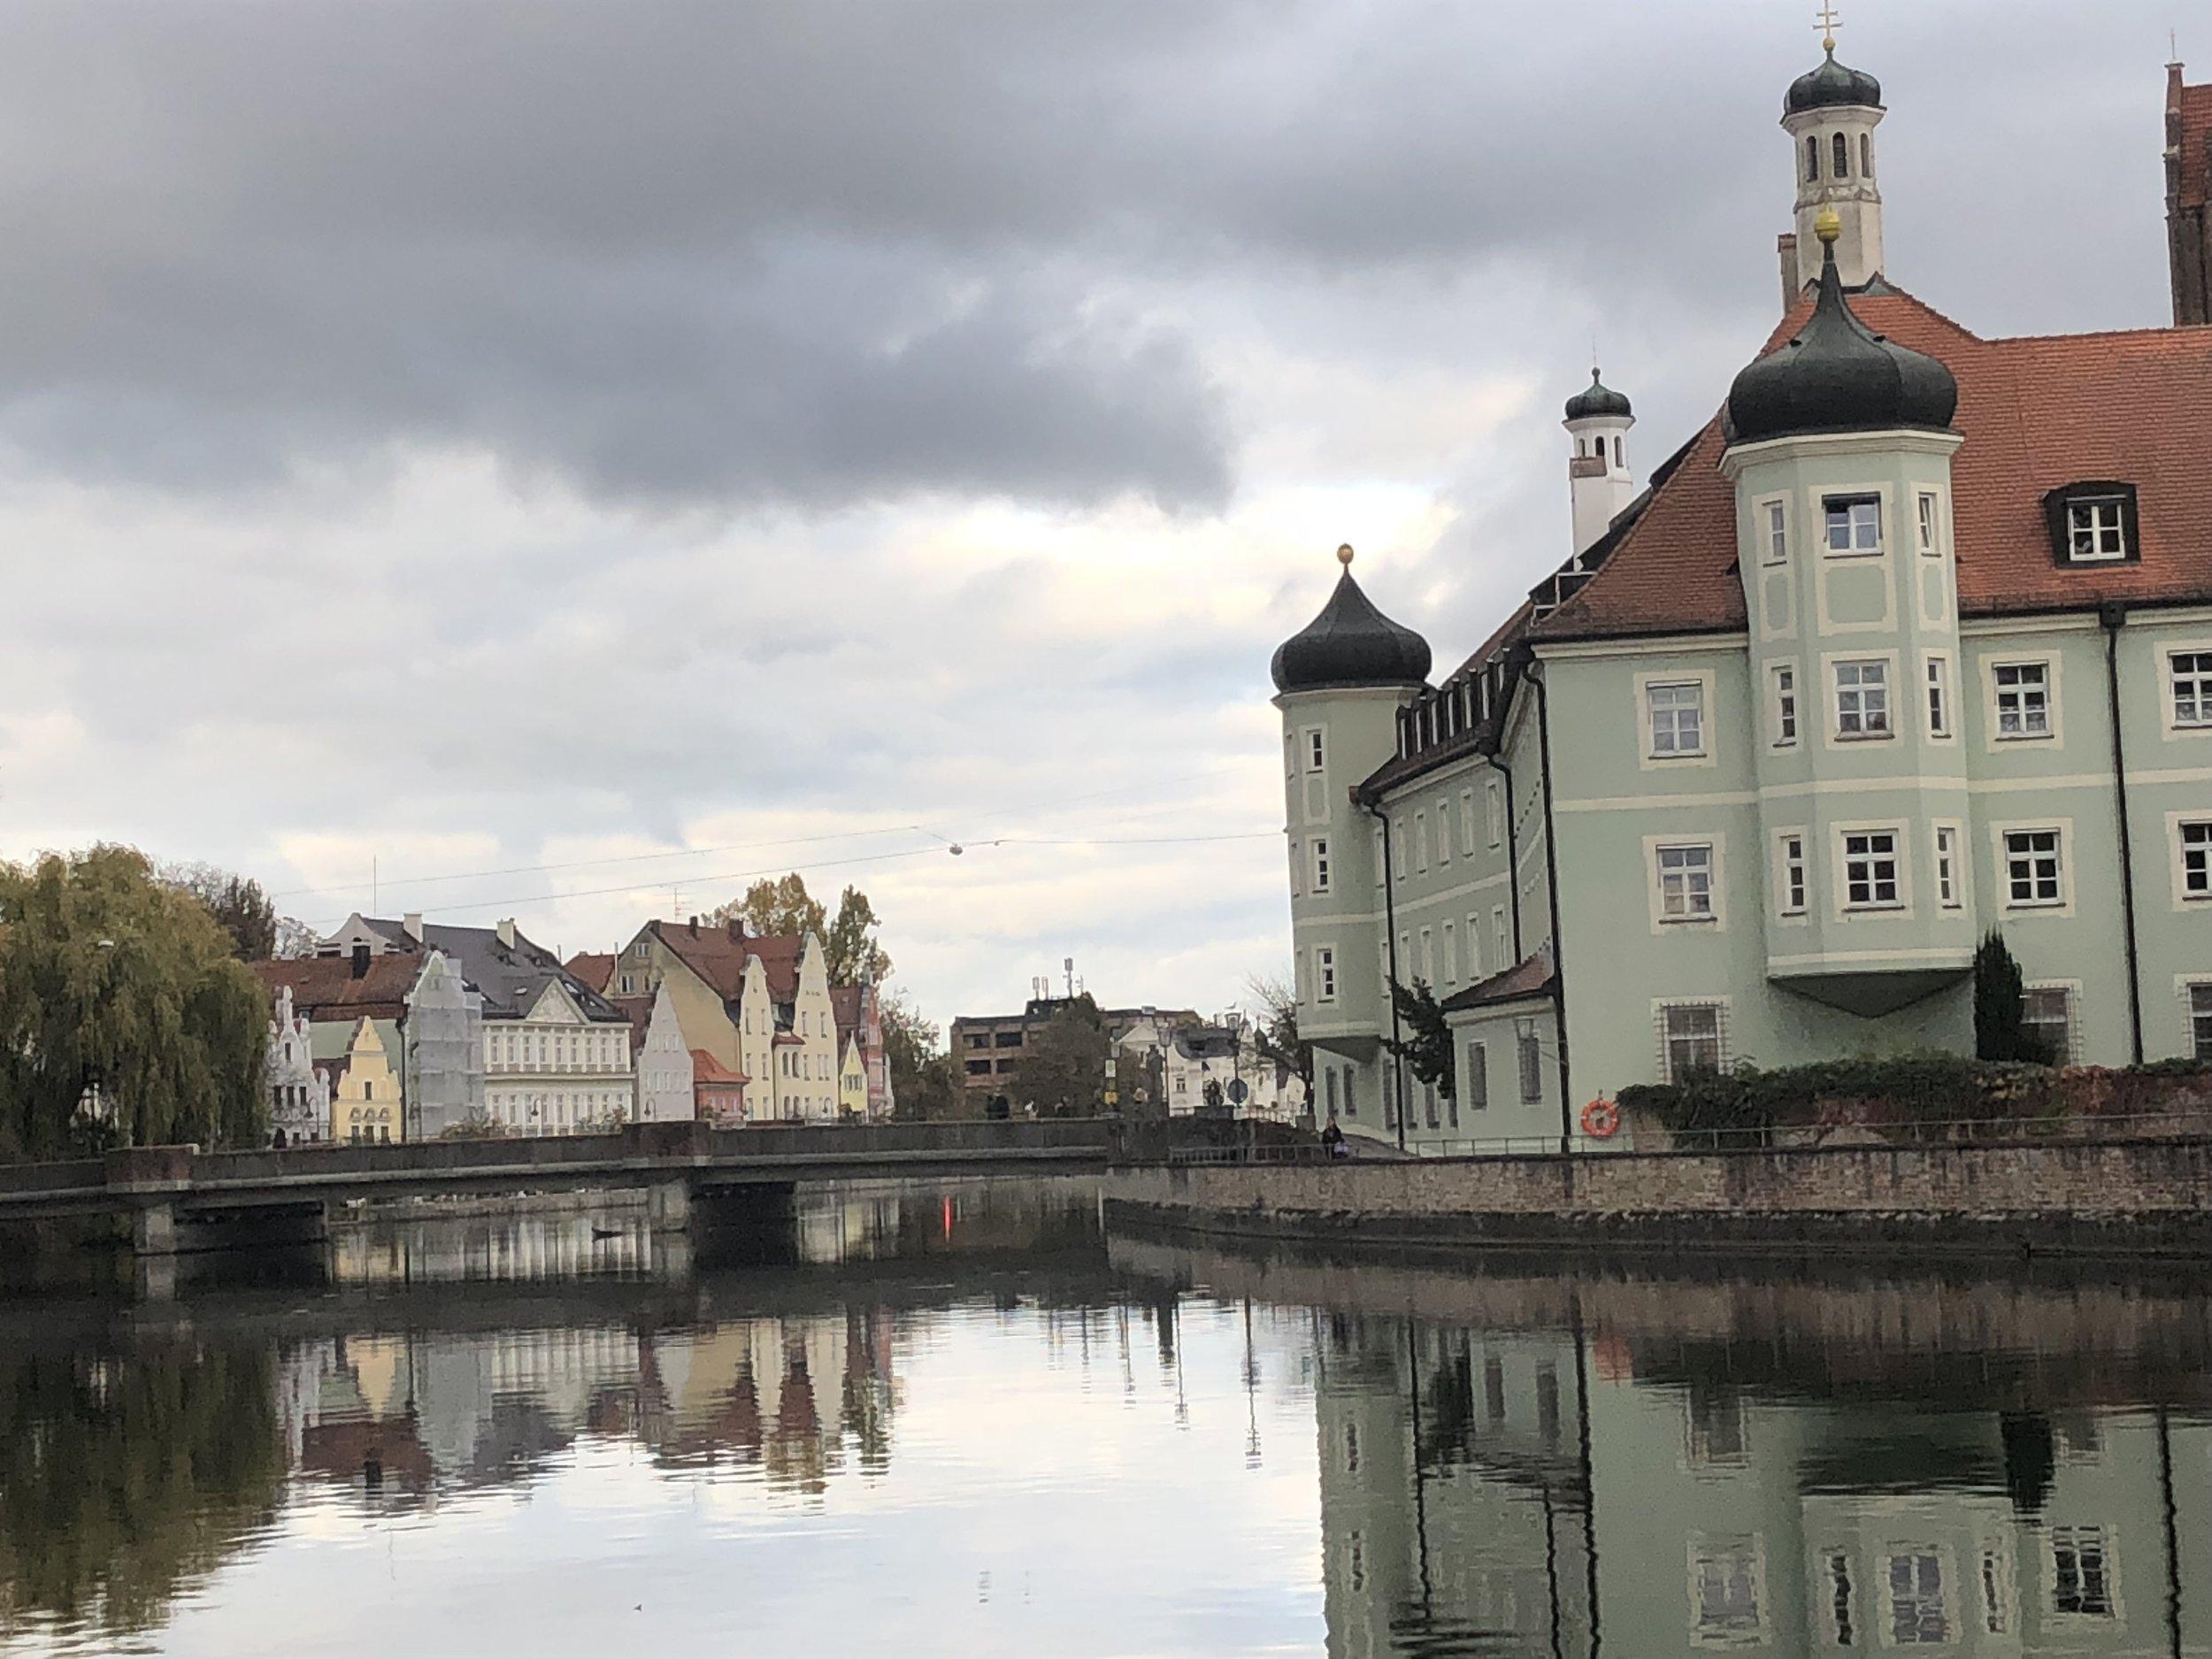 This is the Isar that flows through Landshut on it's way to Munich.